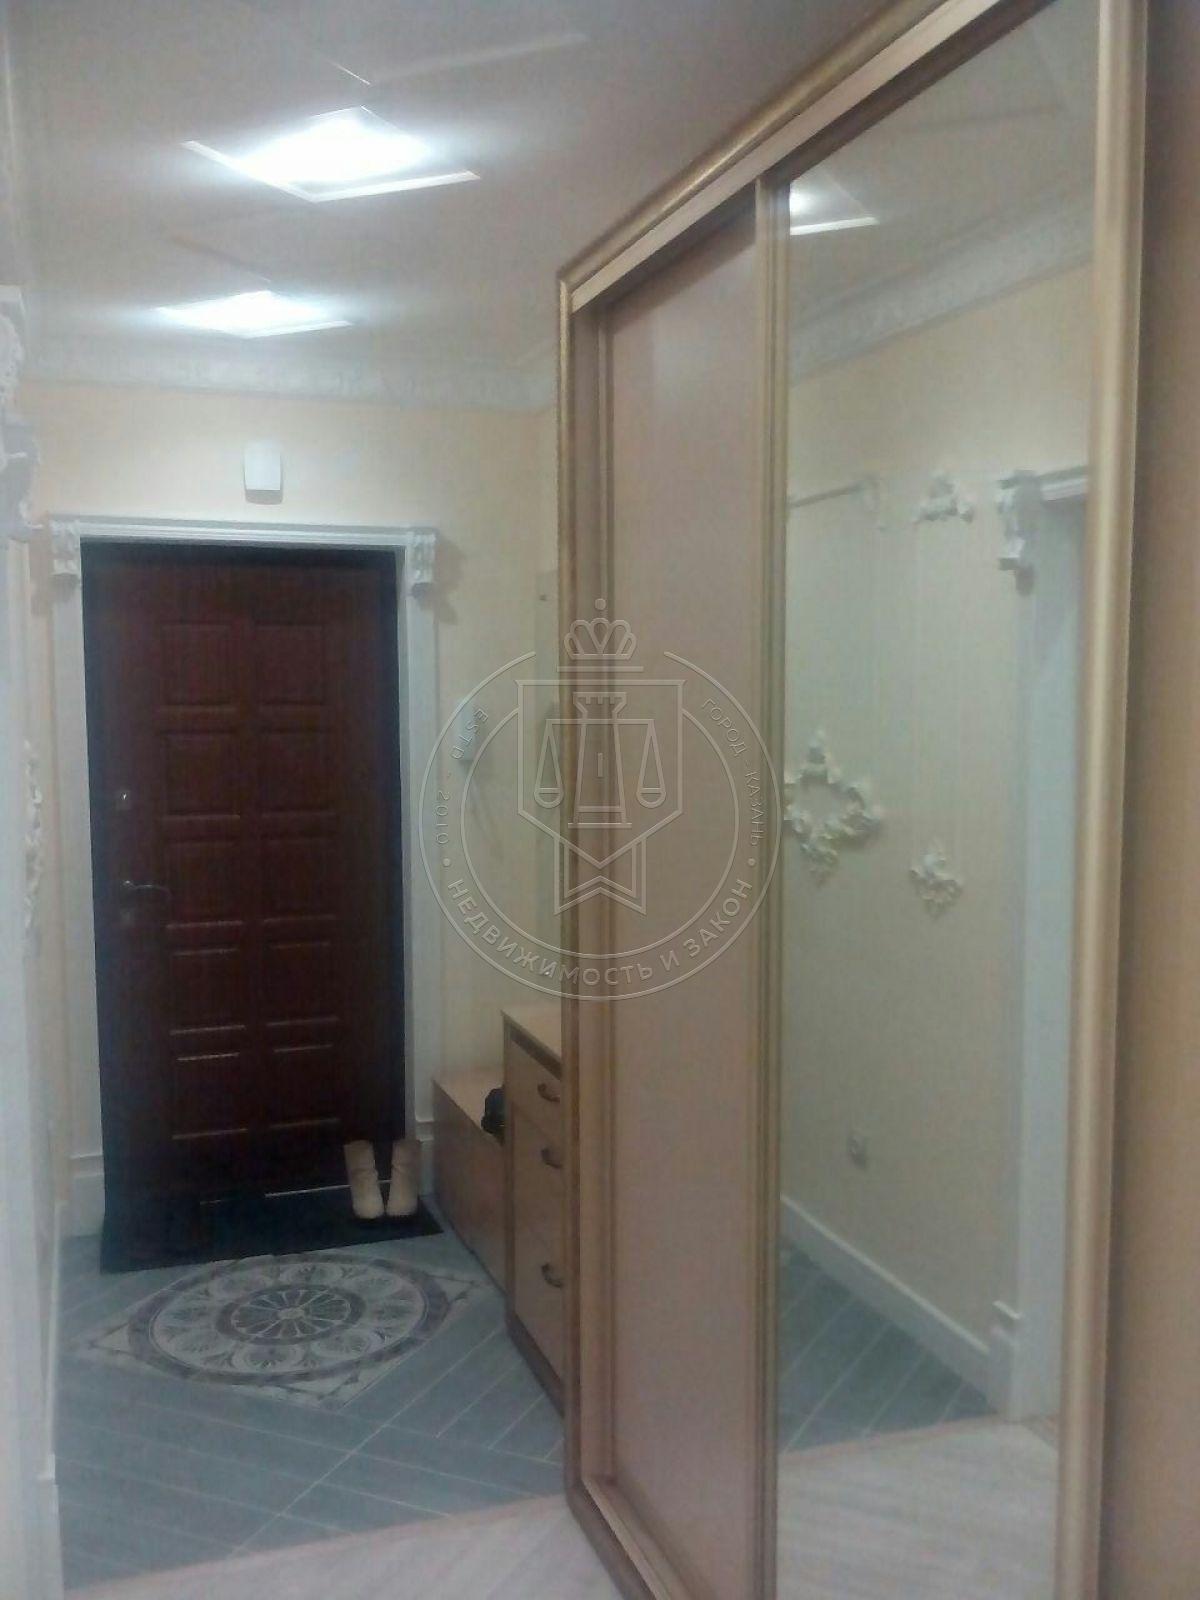 Продажа 2-к квартиры Четаева ул, 10, 68 м²  (миниатюра №5)